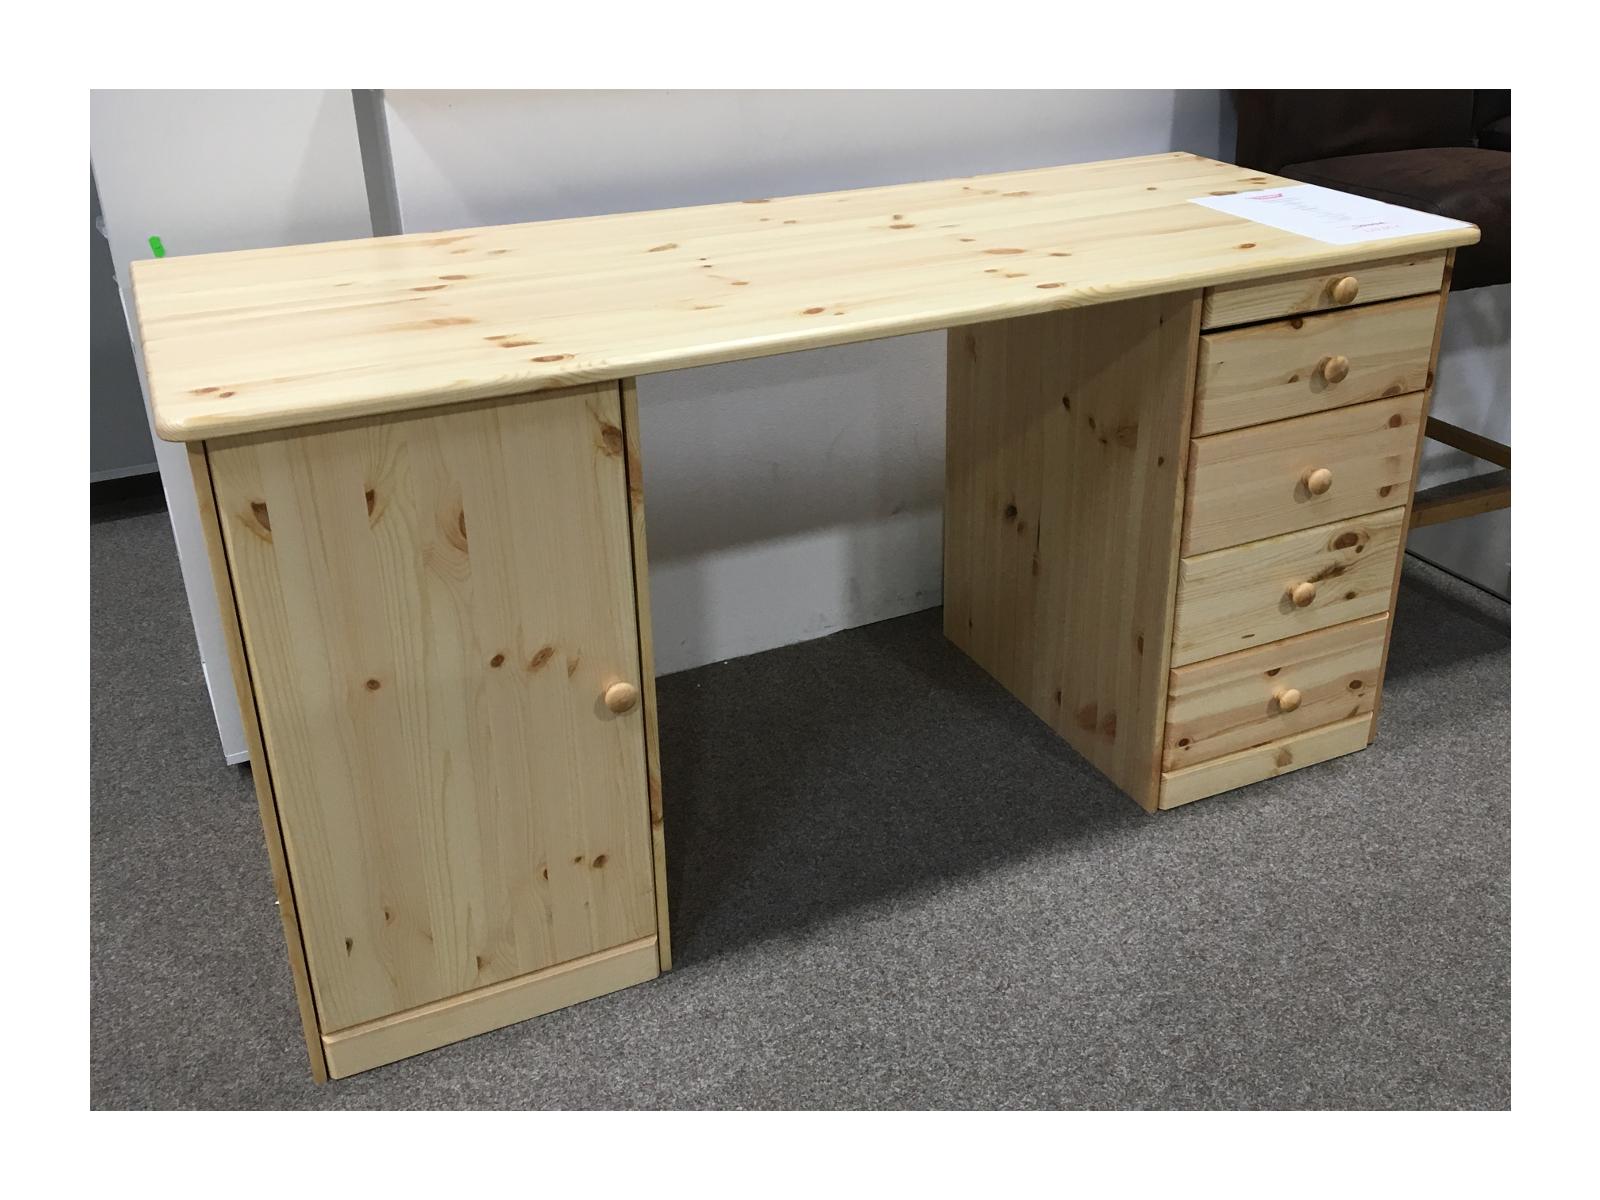 Schreibtisch phillina i kiefer massivholz lackiert shabby for Schreibtisch kiefer lackiert